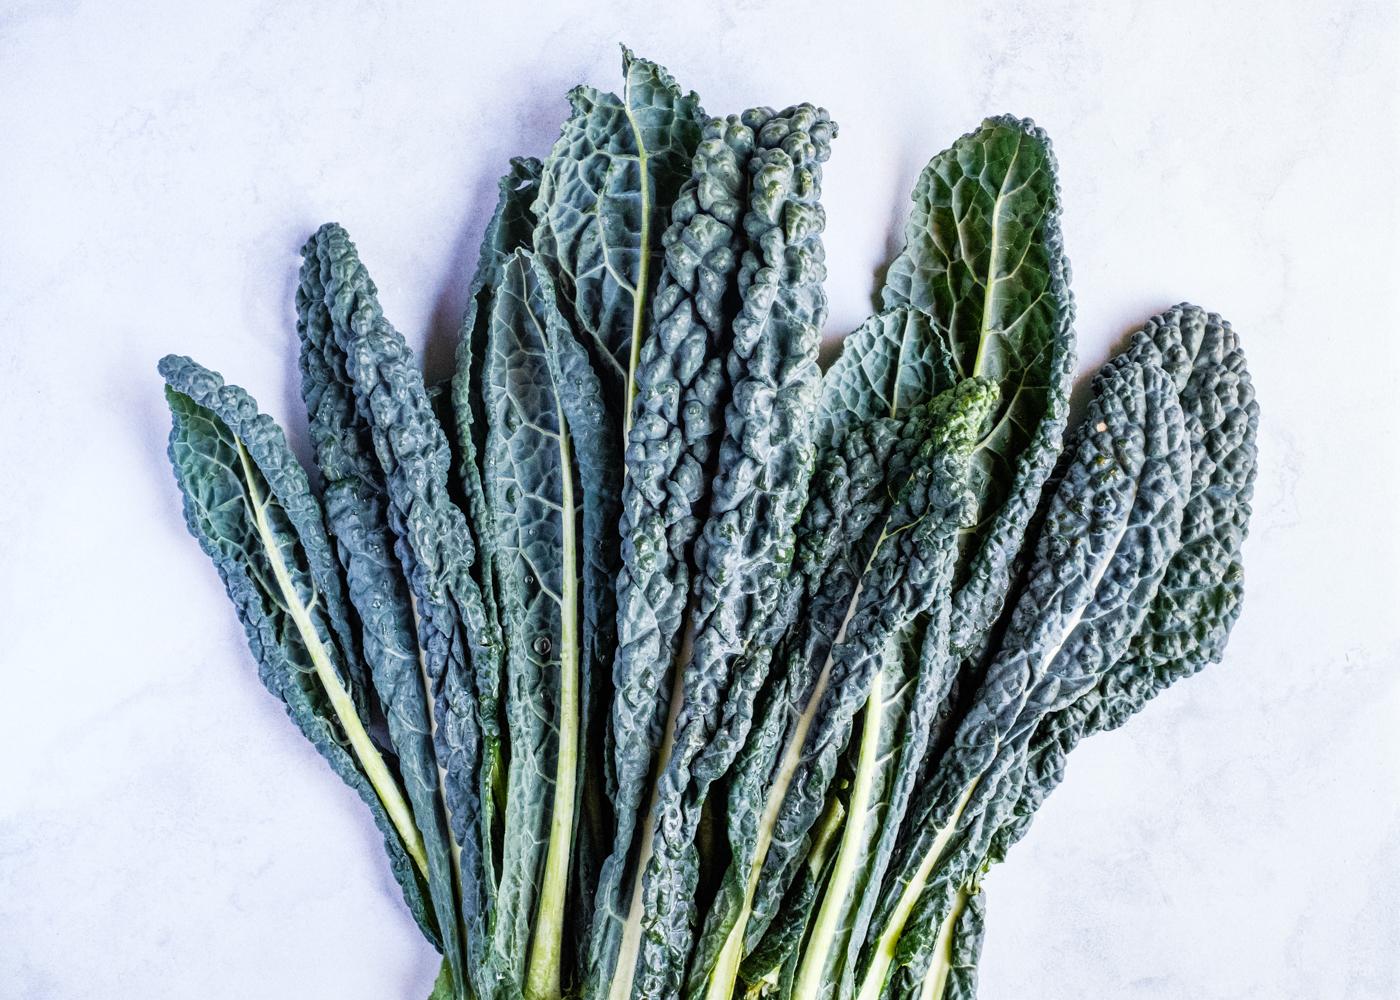 Lacinato kale used for this pesto